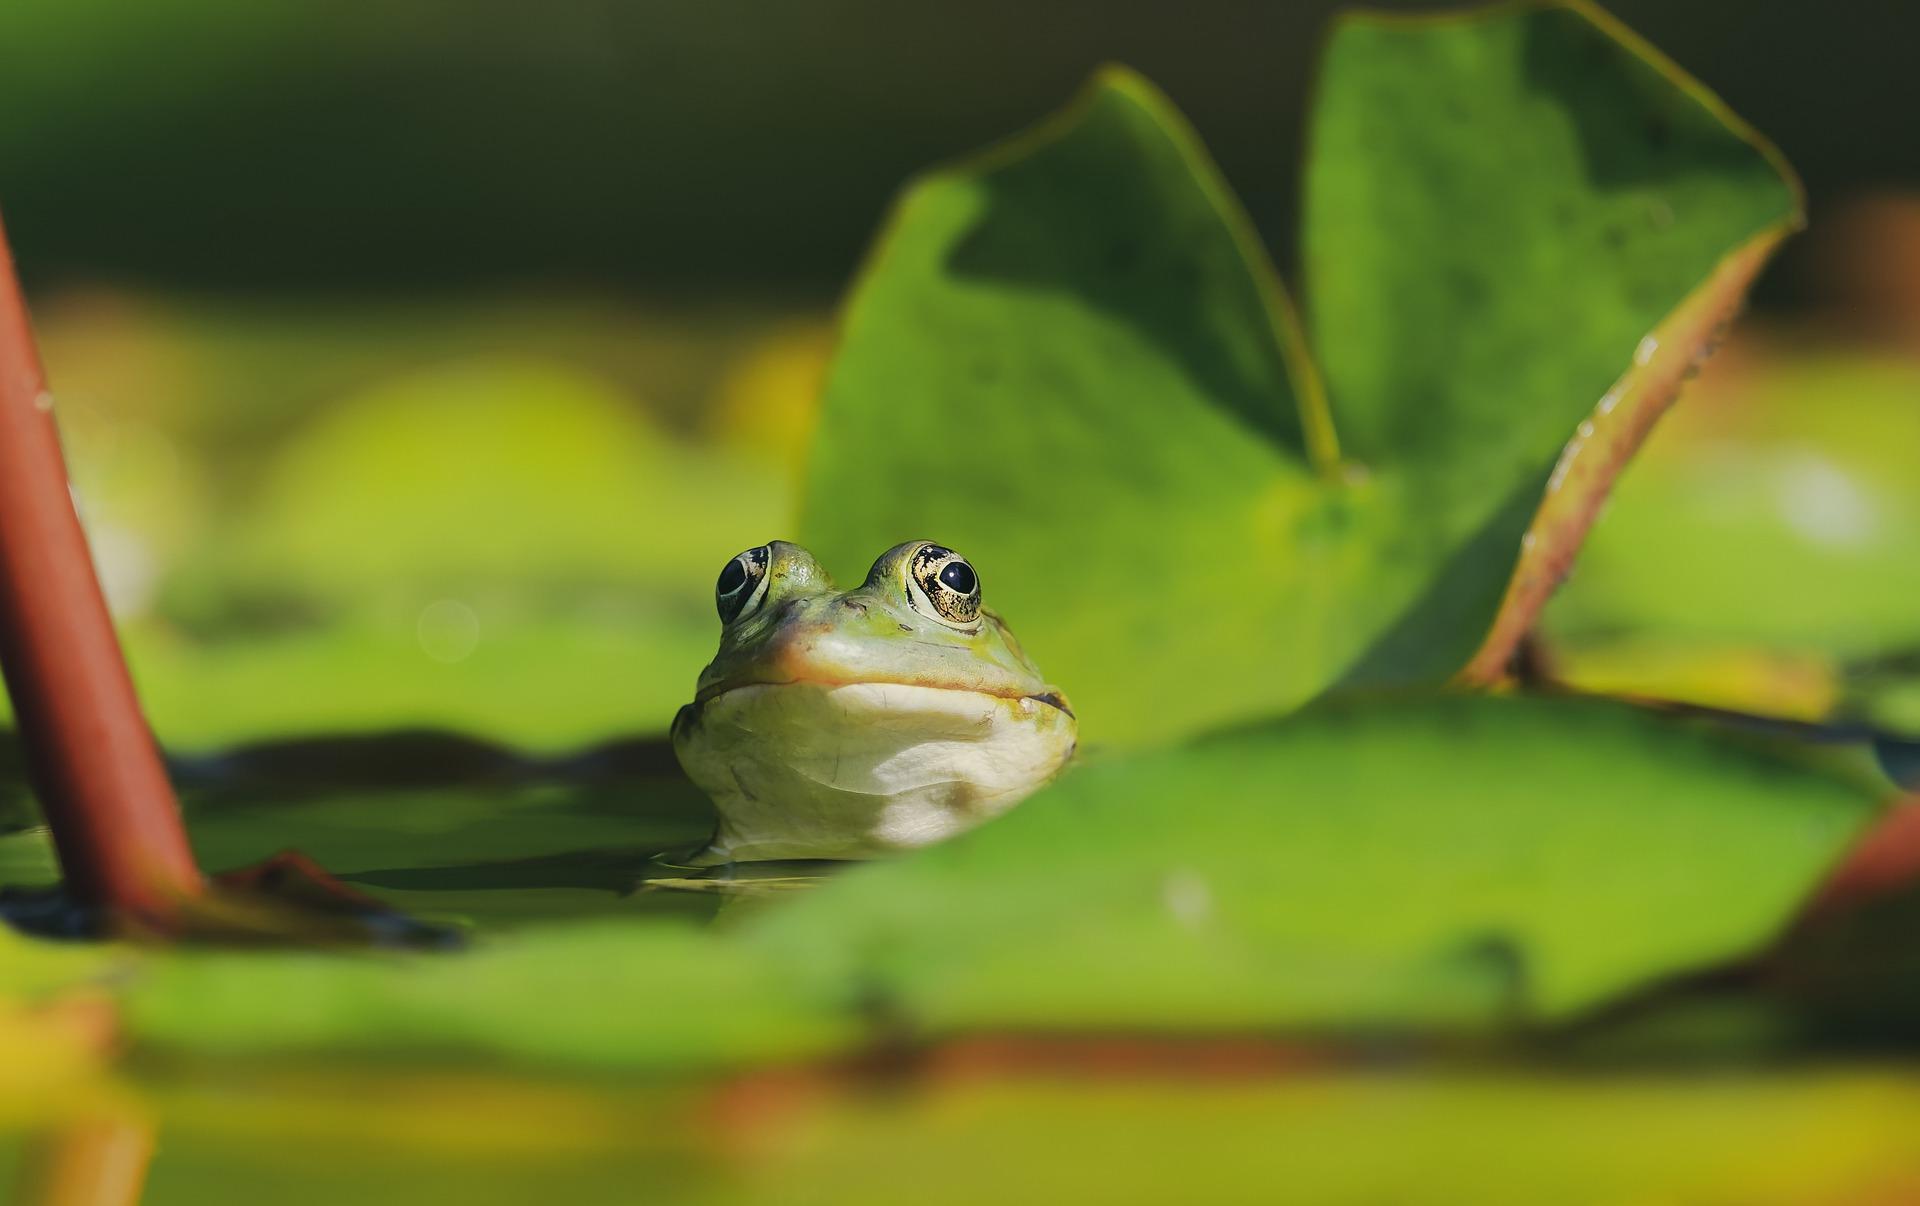 Reptile and amphibian surveys